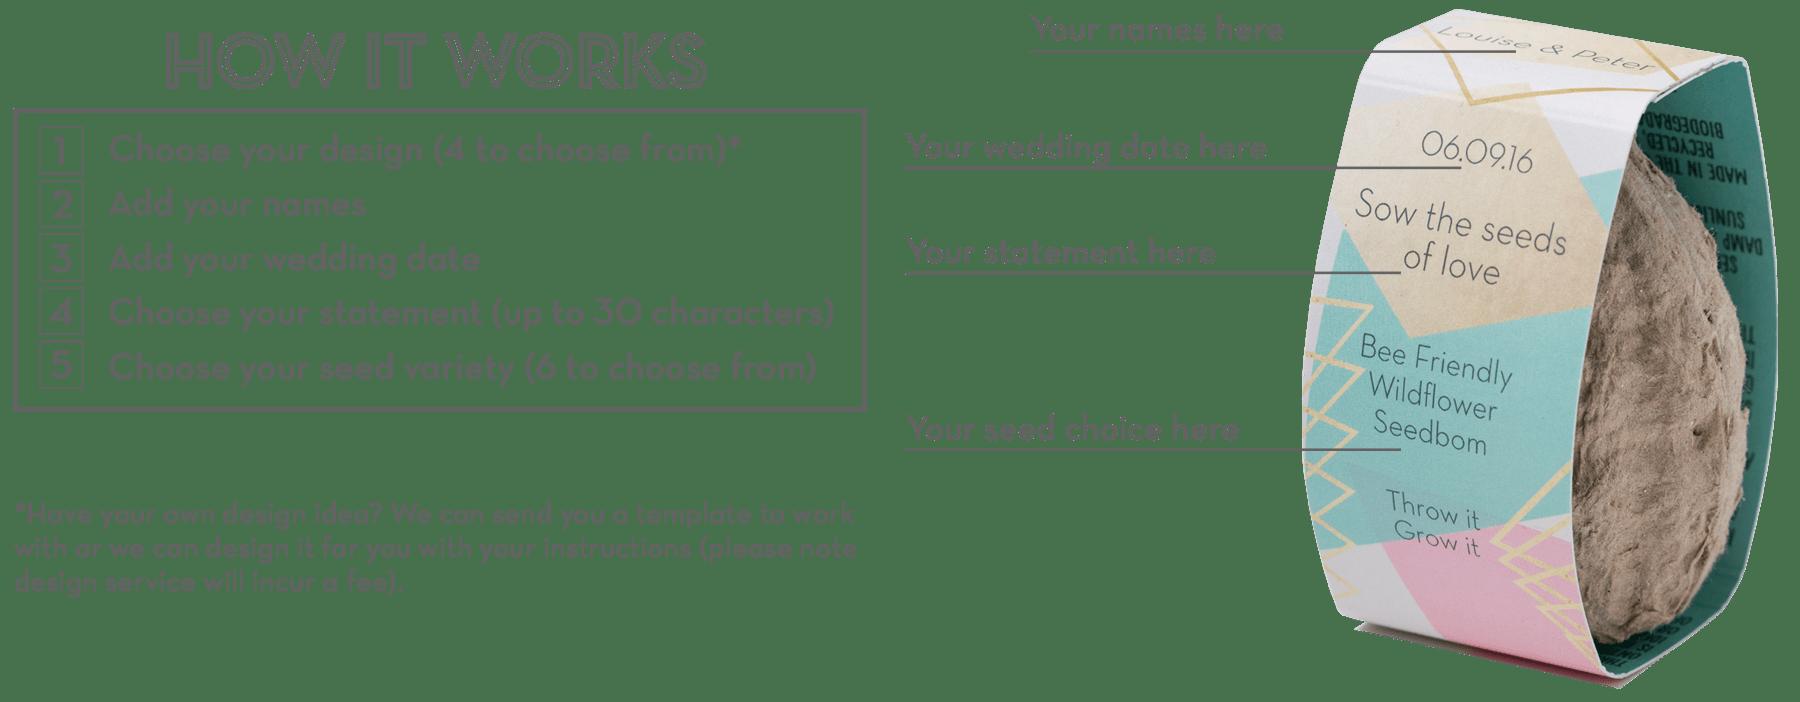 Wedding - How it works1